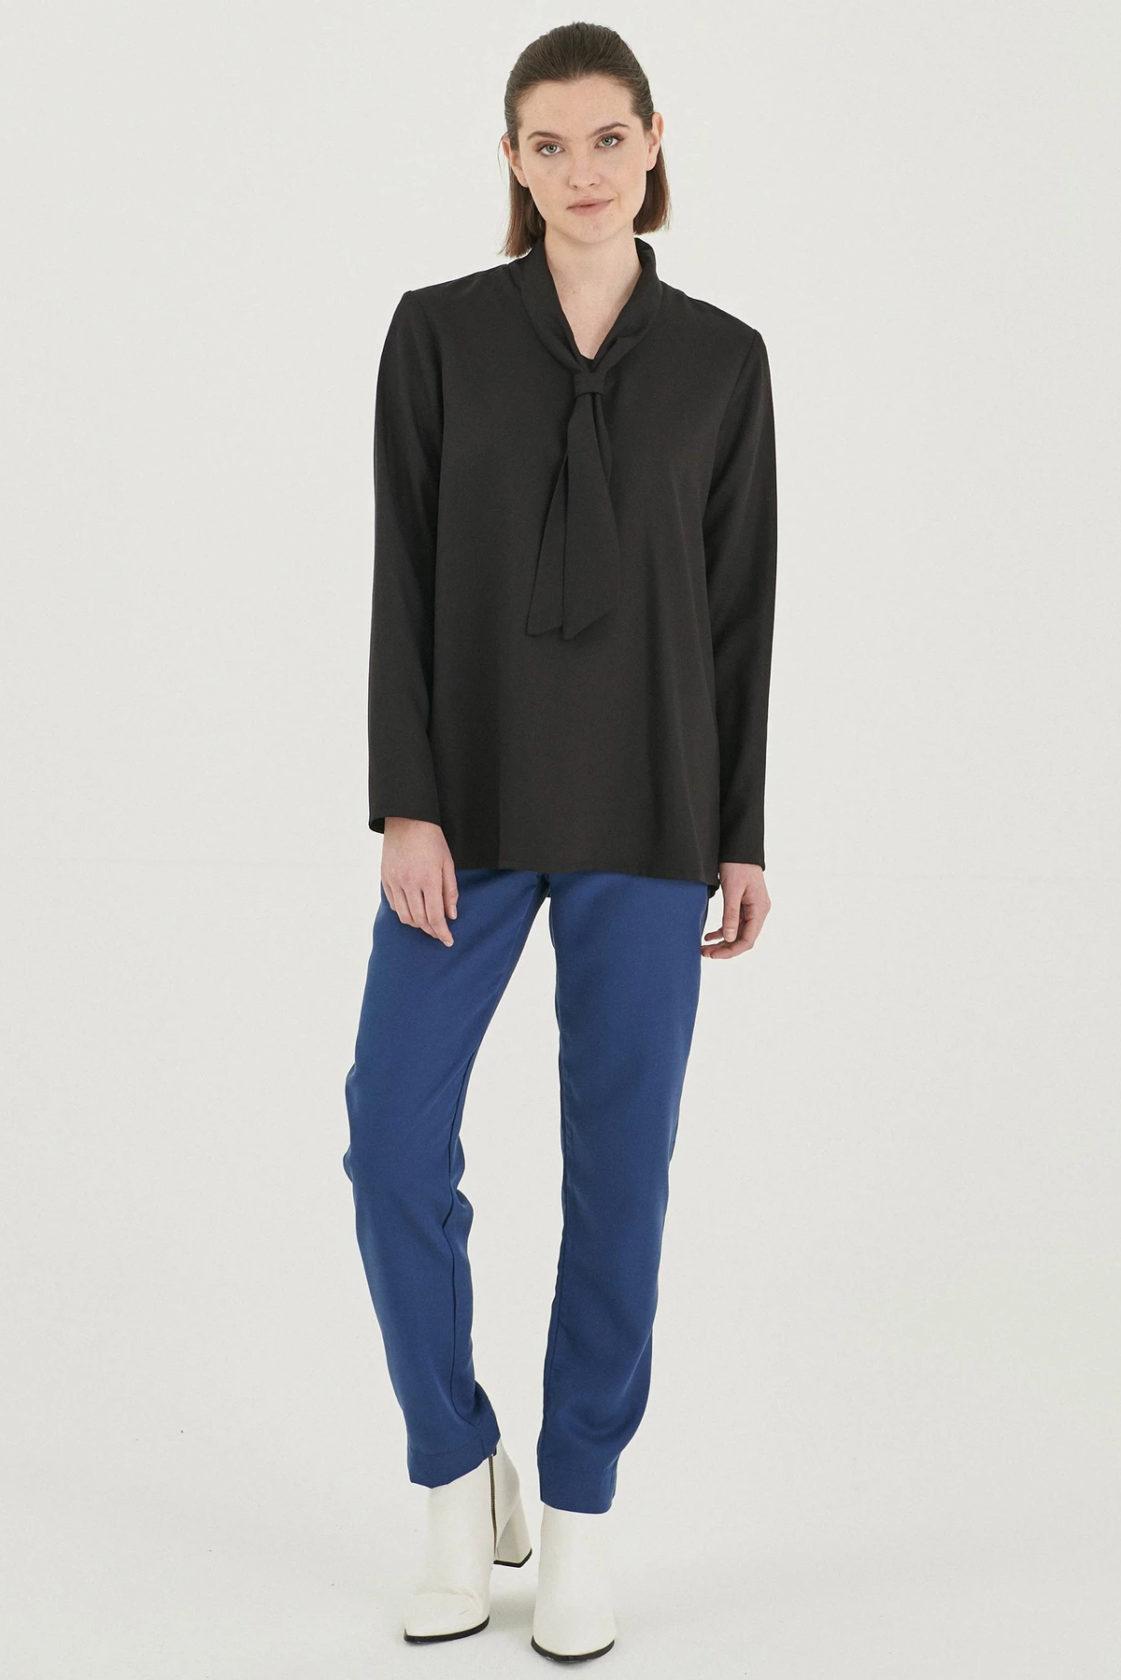 Roberta Organic Fashion Organication Bluse Black 4